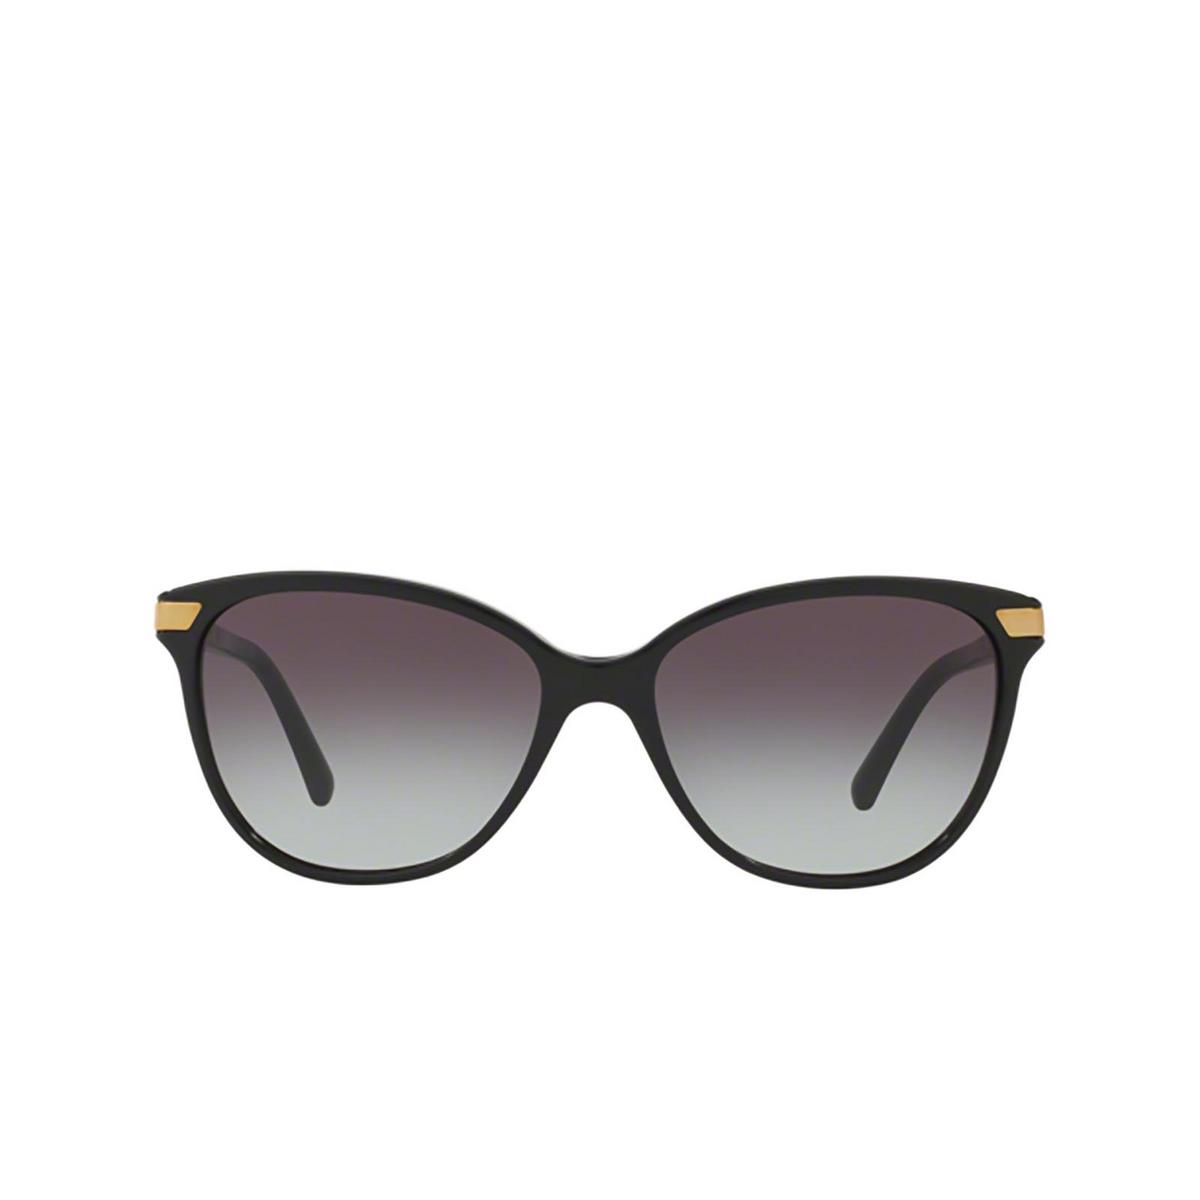 Burberry® Cat-eye Sunglasses: BE4216 color Black 30018G.